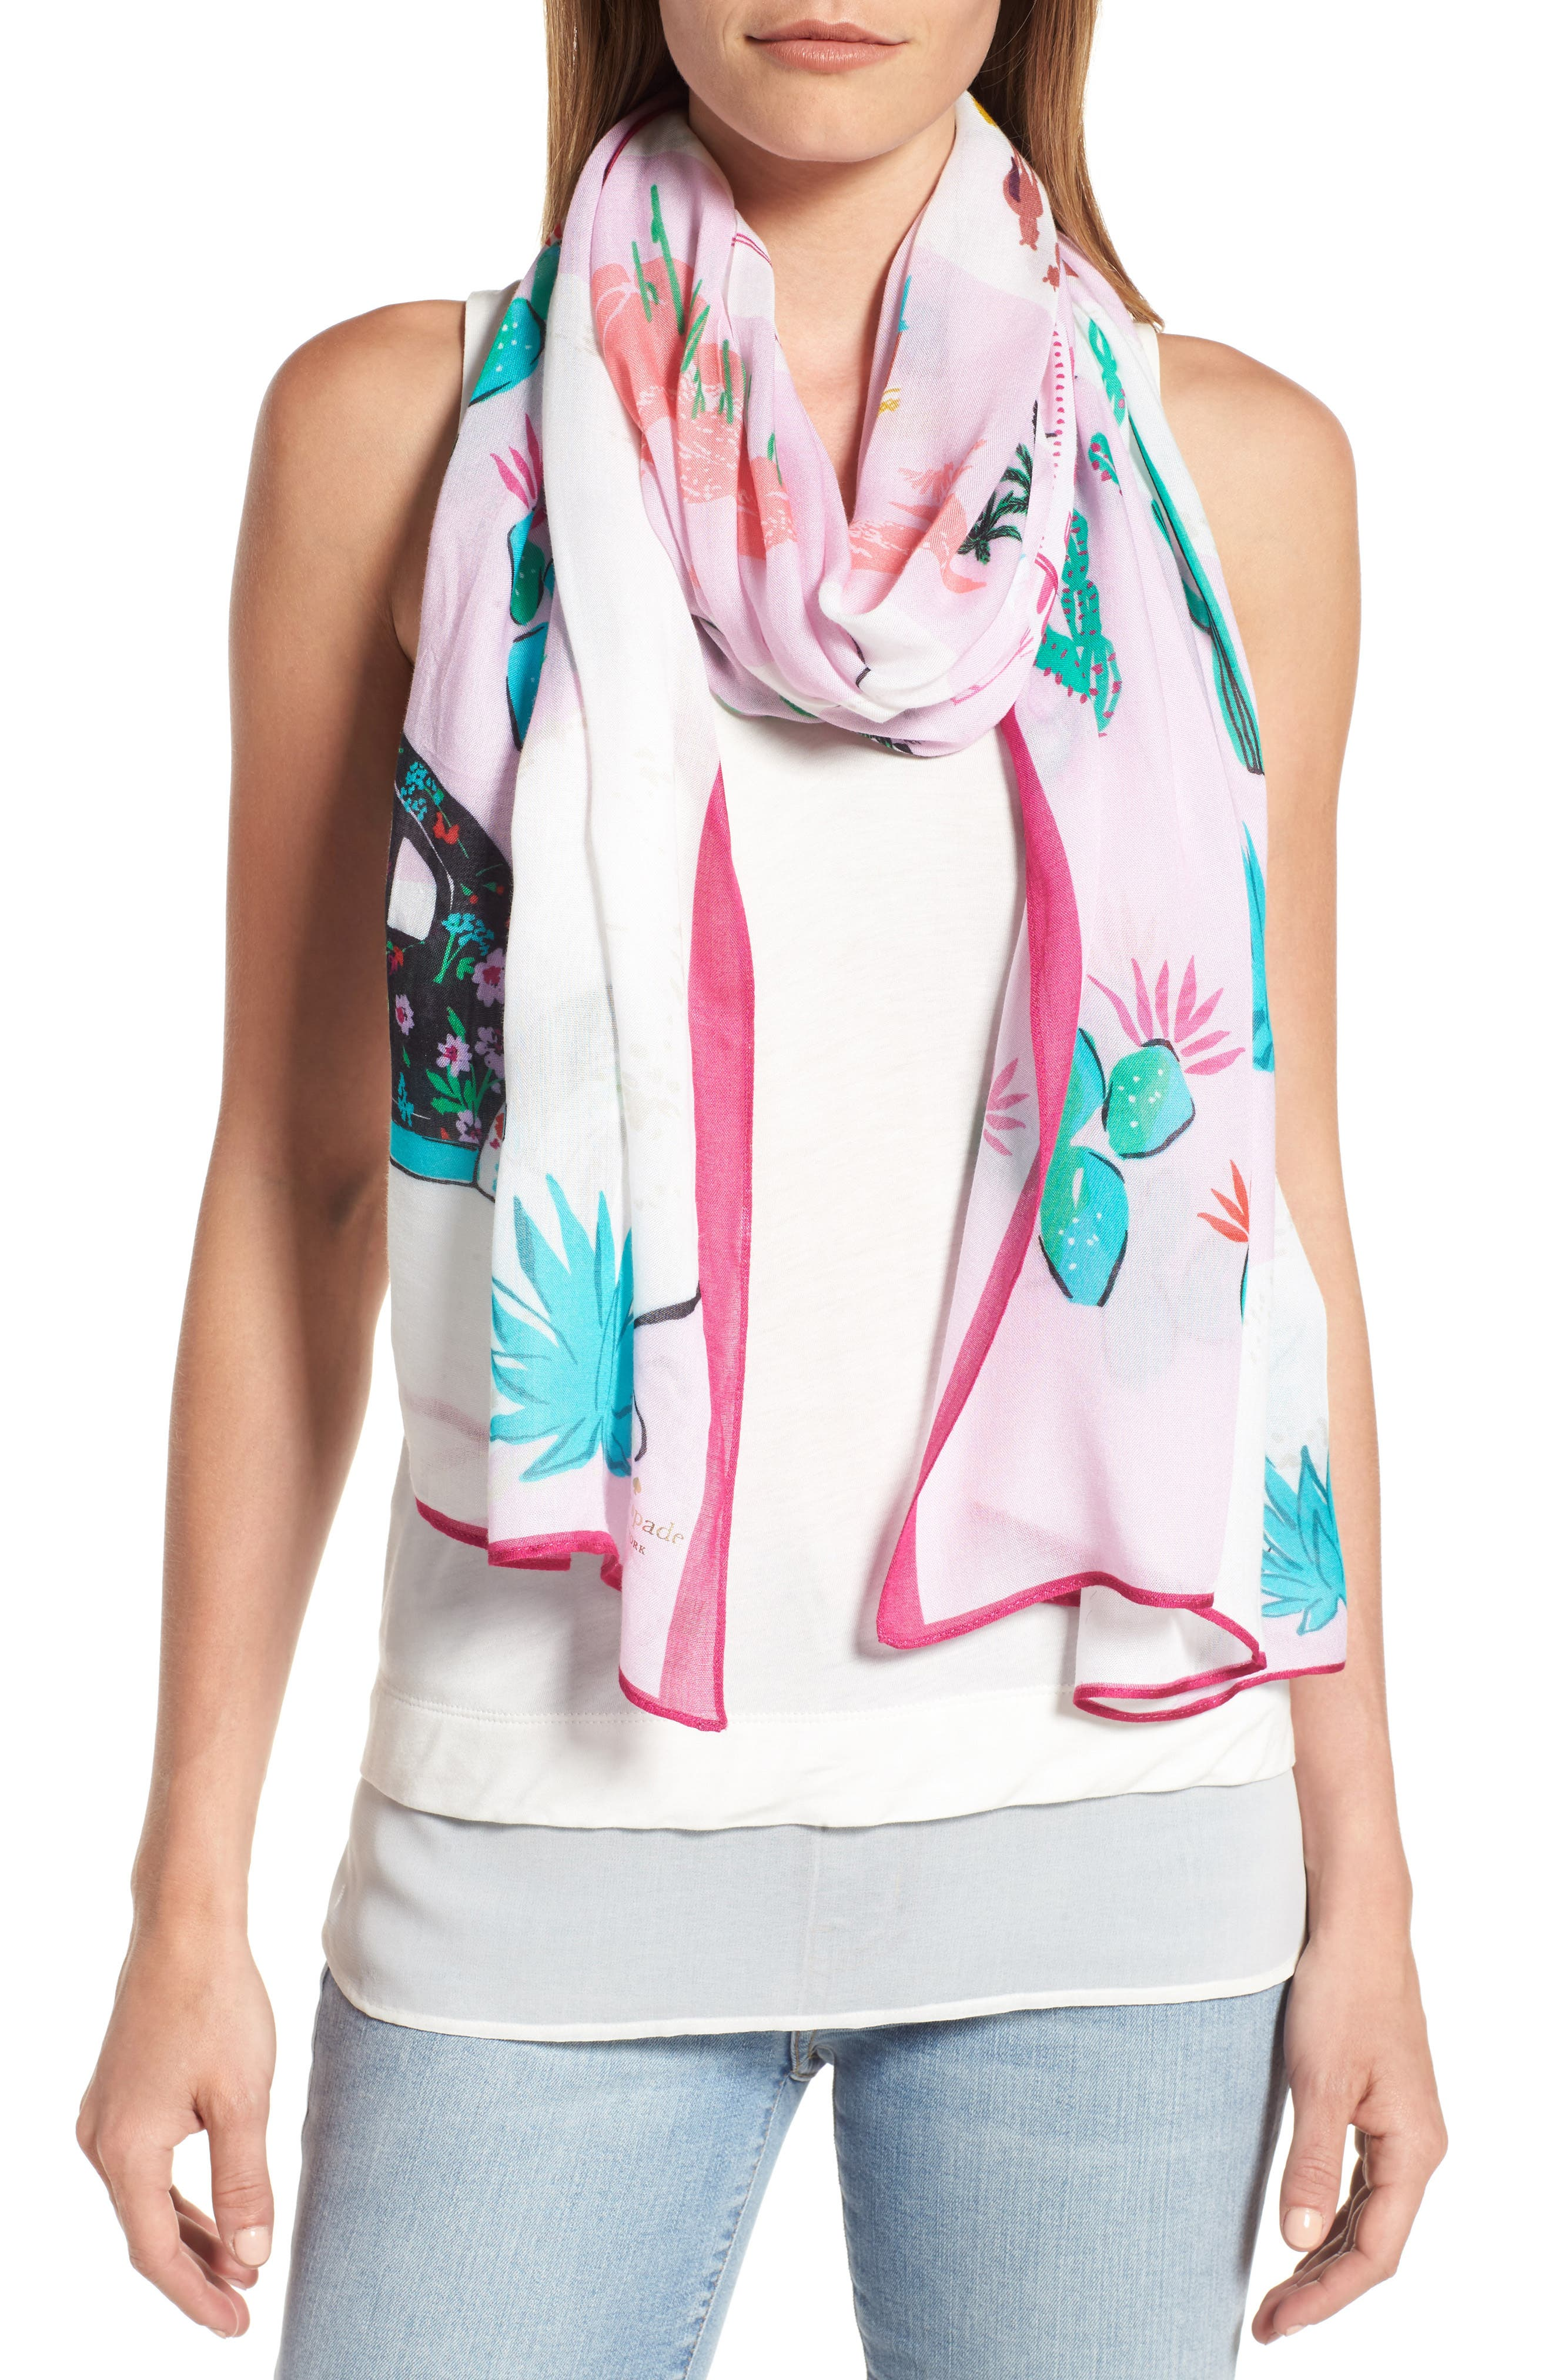 KATE SPADE NEW YORK roadmap oblong scarf